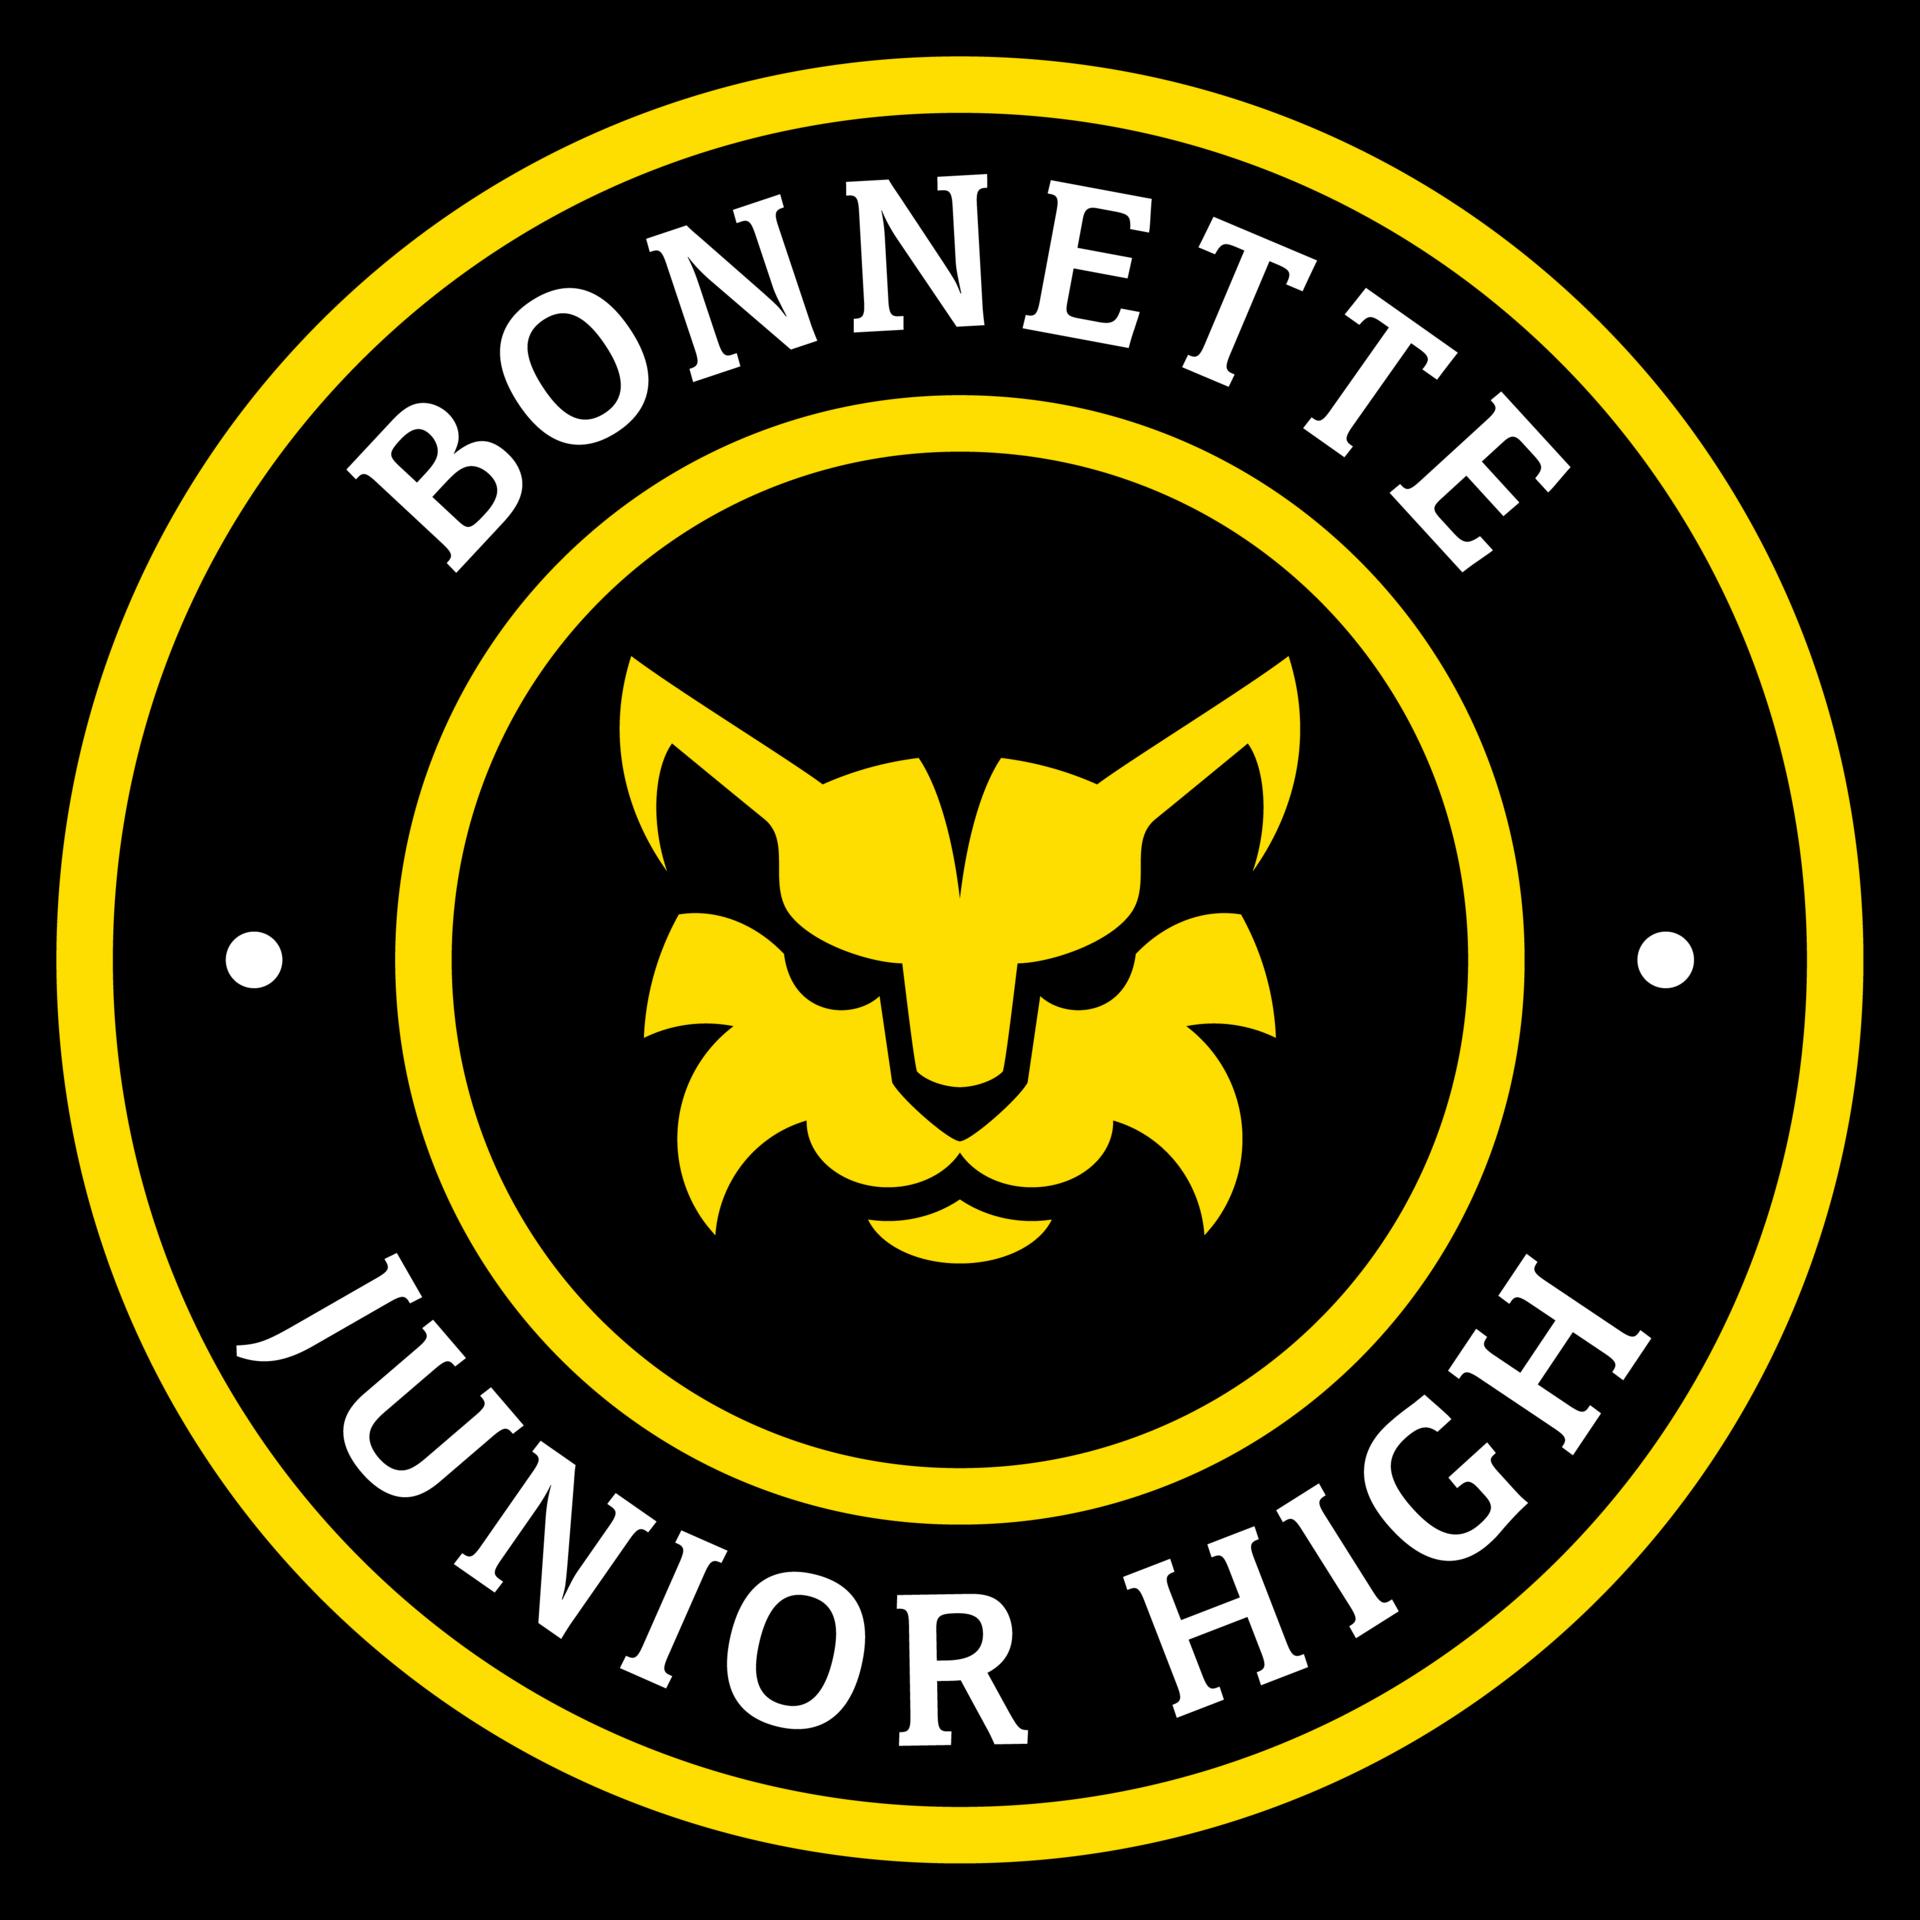 Bonnette Junior HIgh school seal